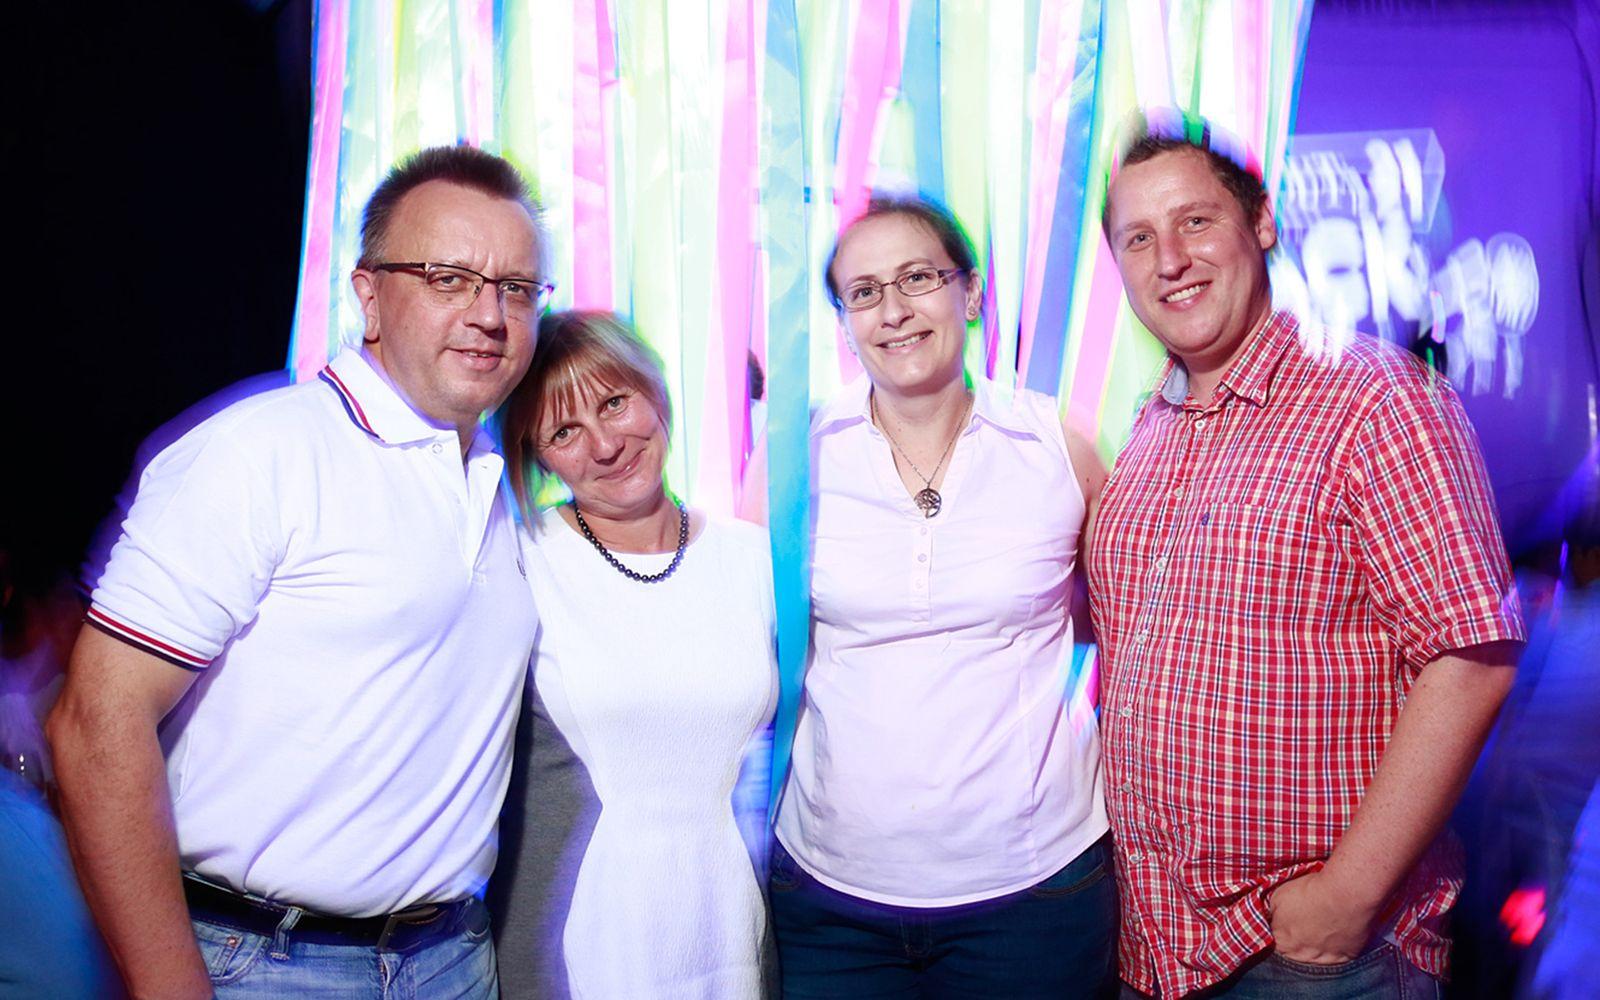 Heiko Ziesmann, Stephanie Ziesmann, Marek Dierks and Simone Dierks